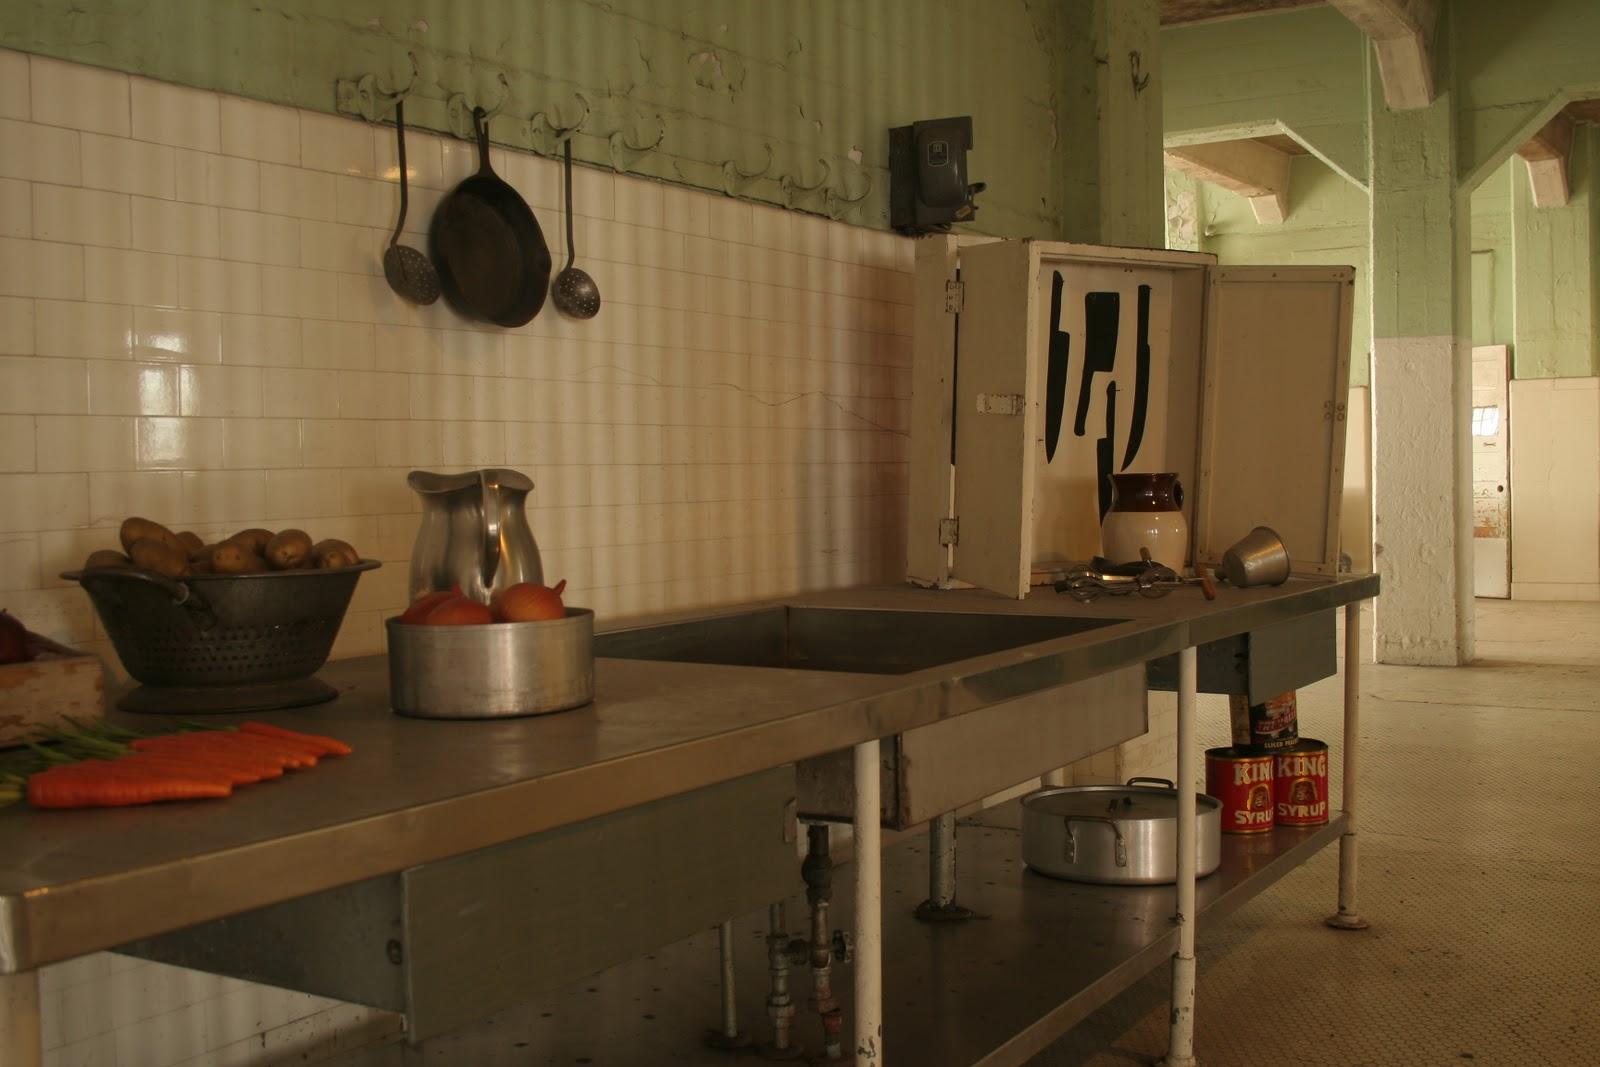 La cuisine de bernard san francisco - Des vers dans la cuisine ...